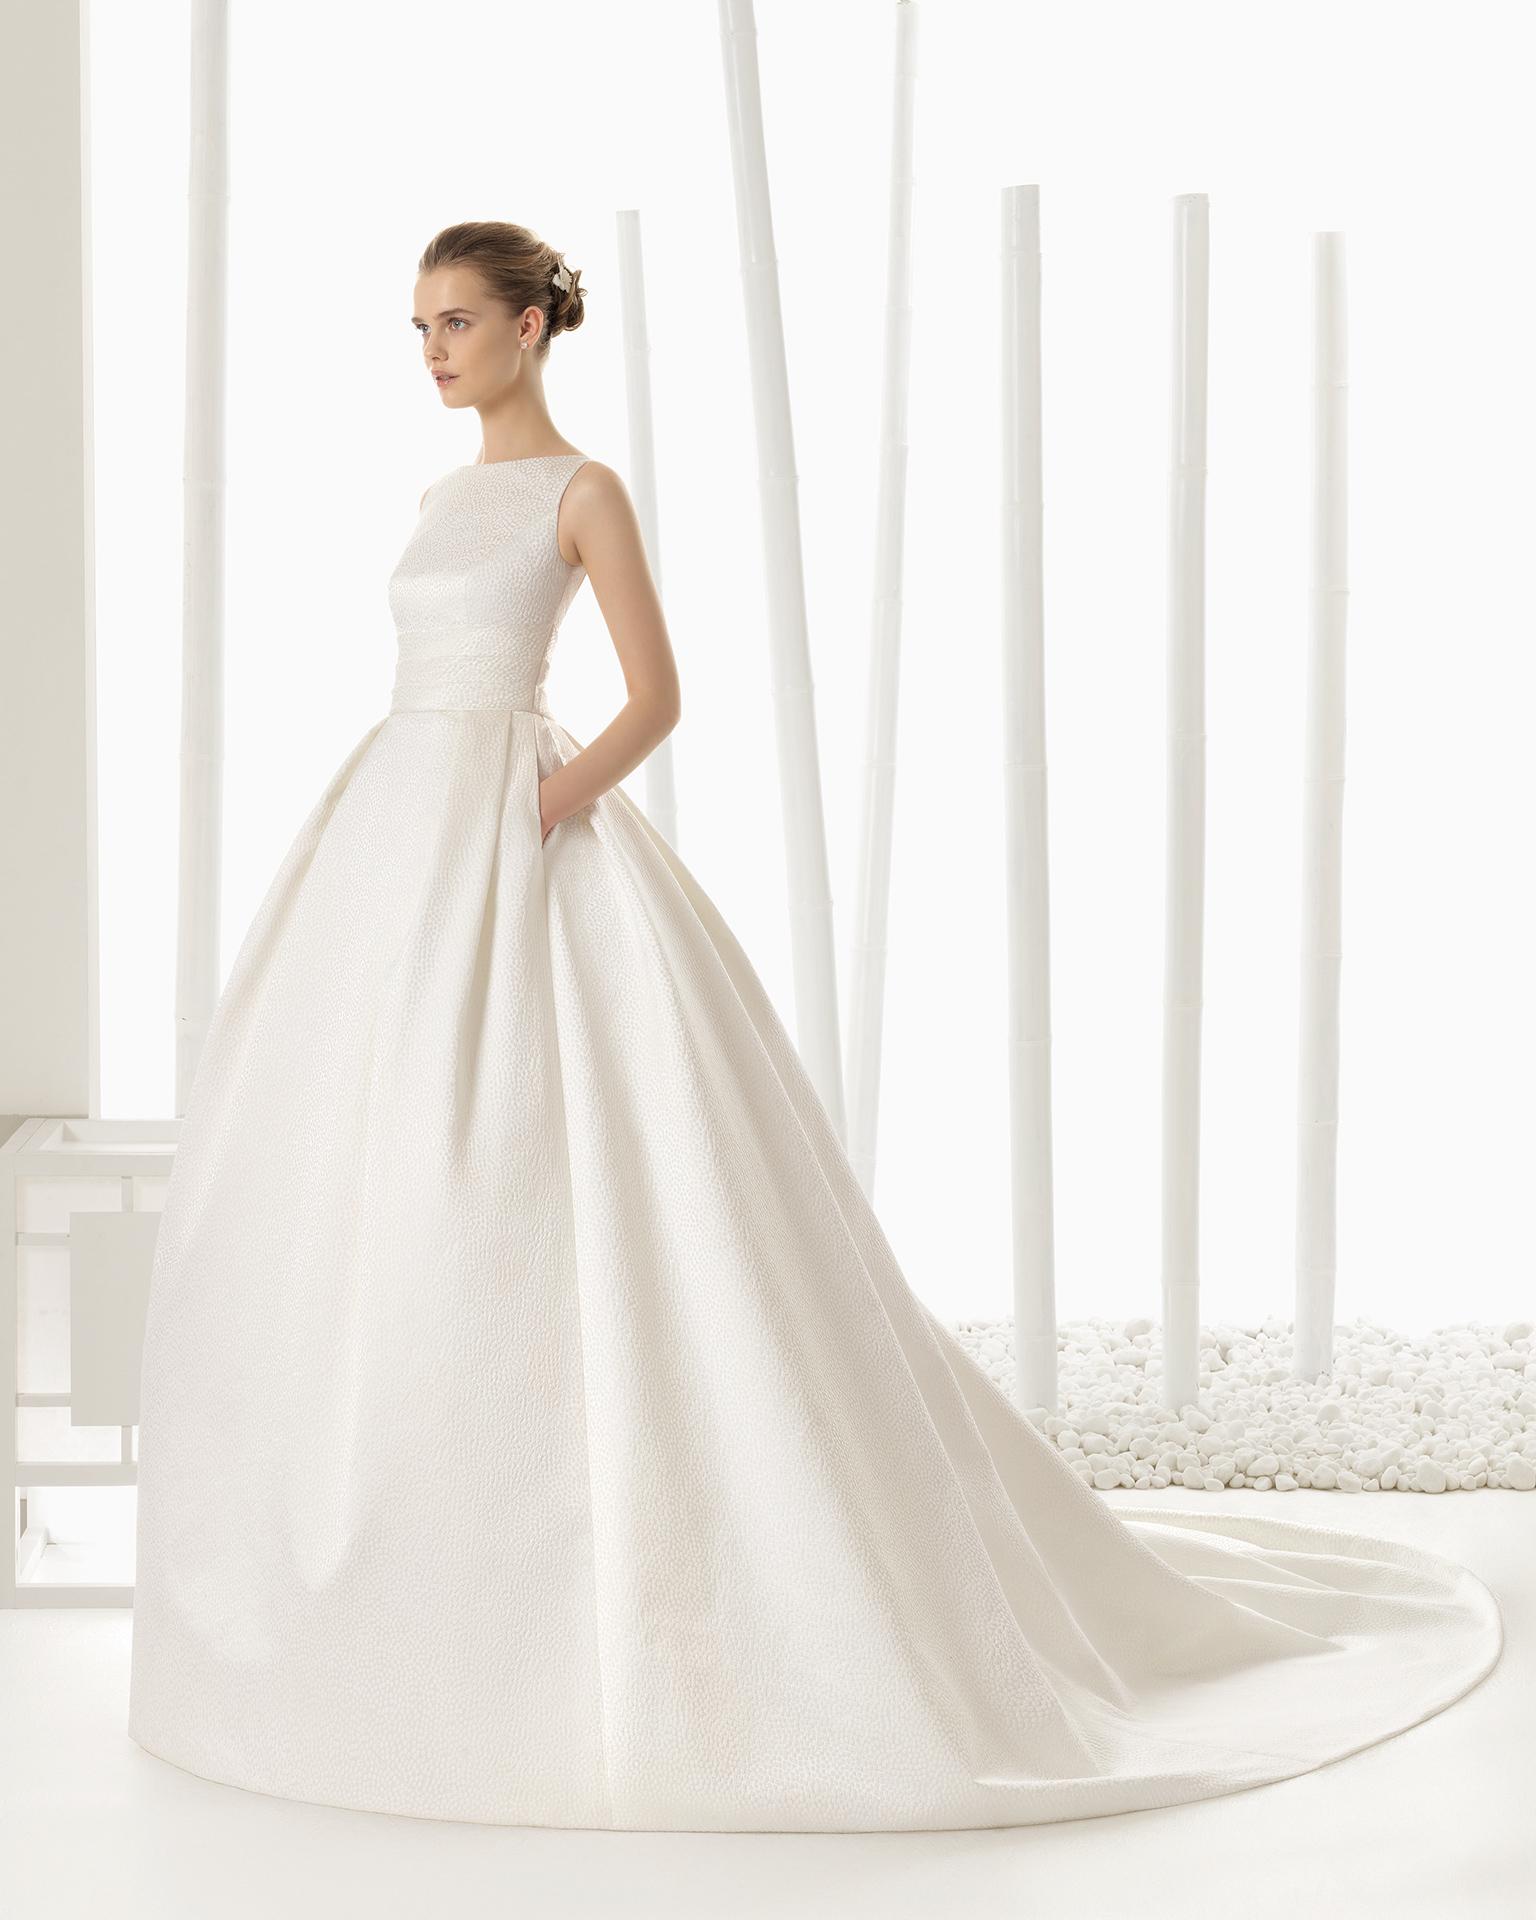 Vestidos de novia pret a porter El blog de Ana Suero